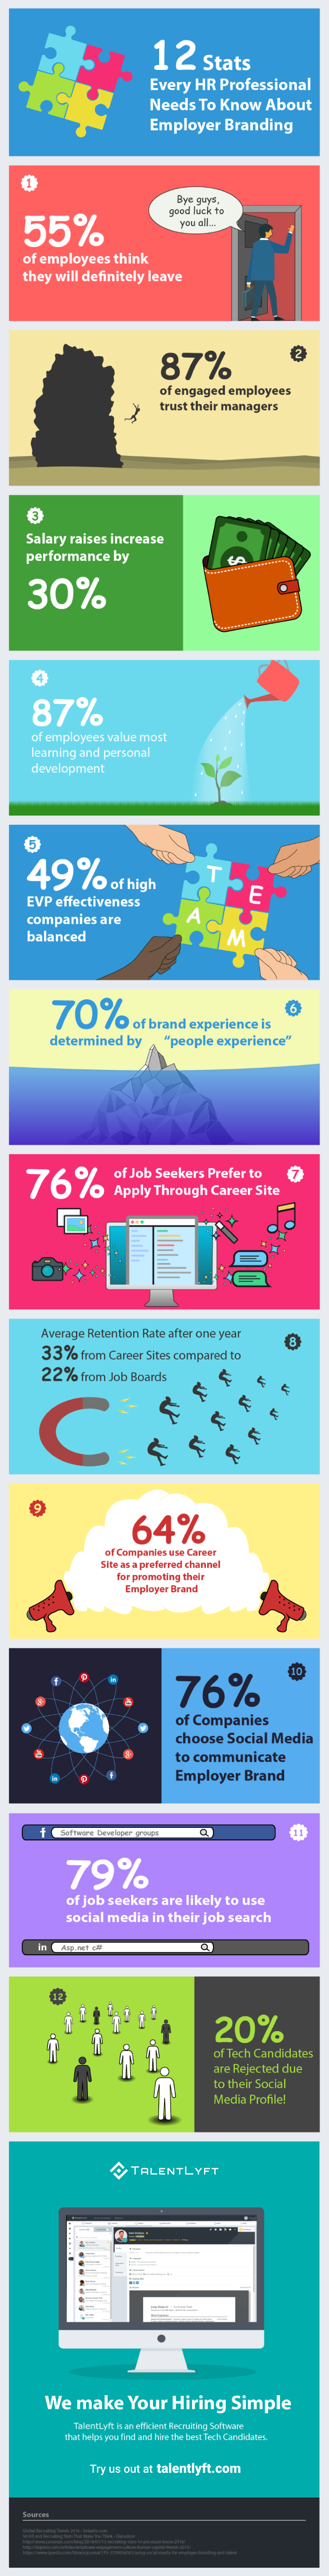 Employer Branding Statistics